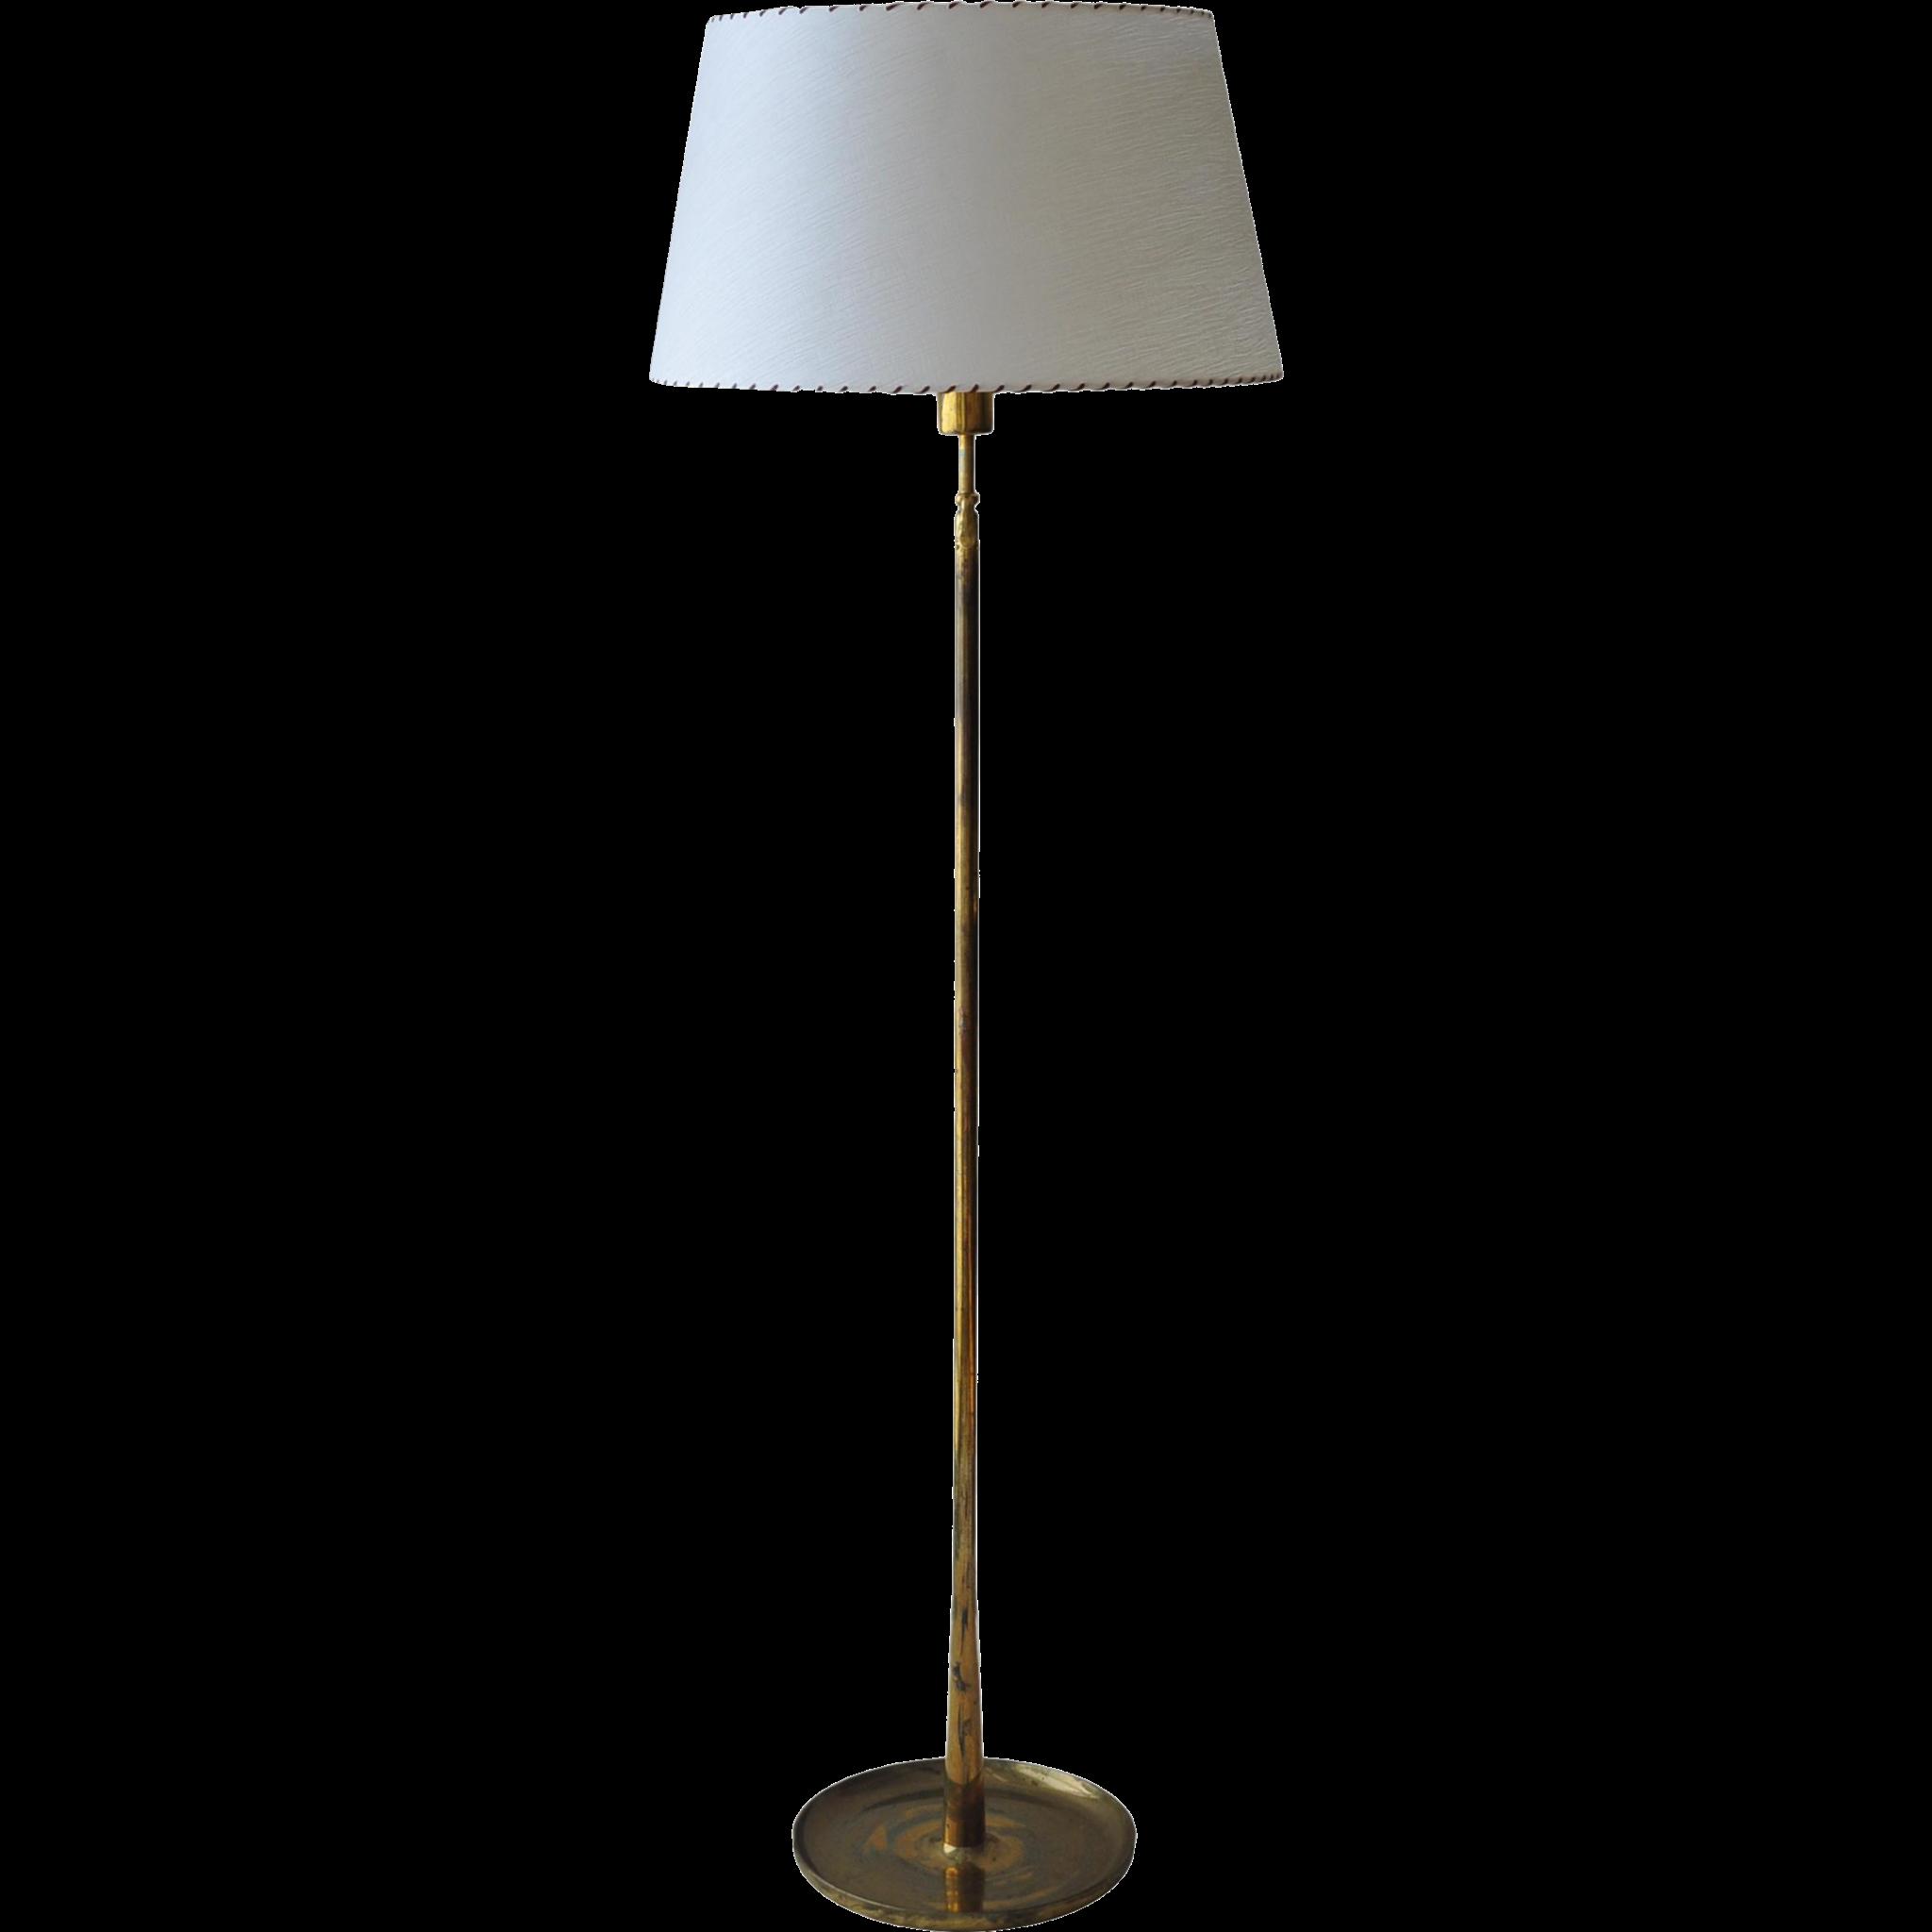 picture transparent download lamp transparent #87235658